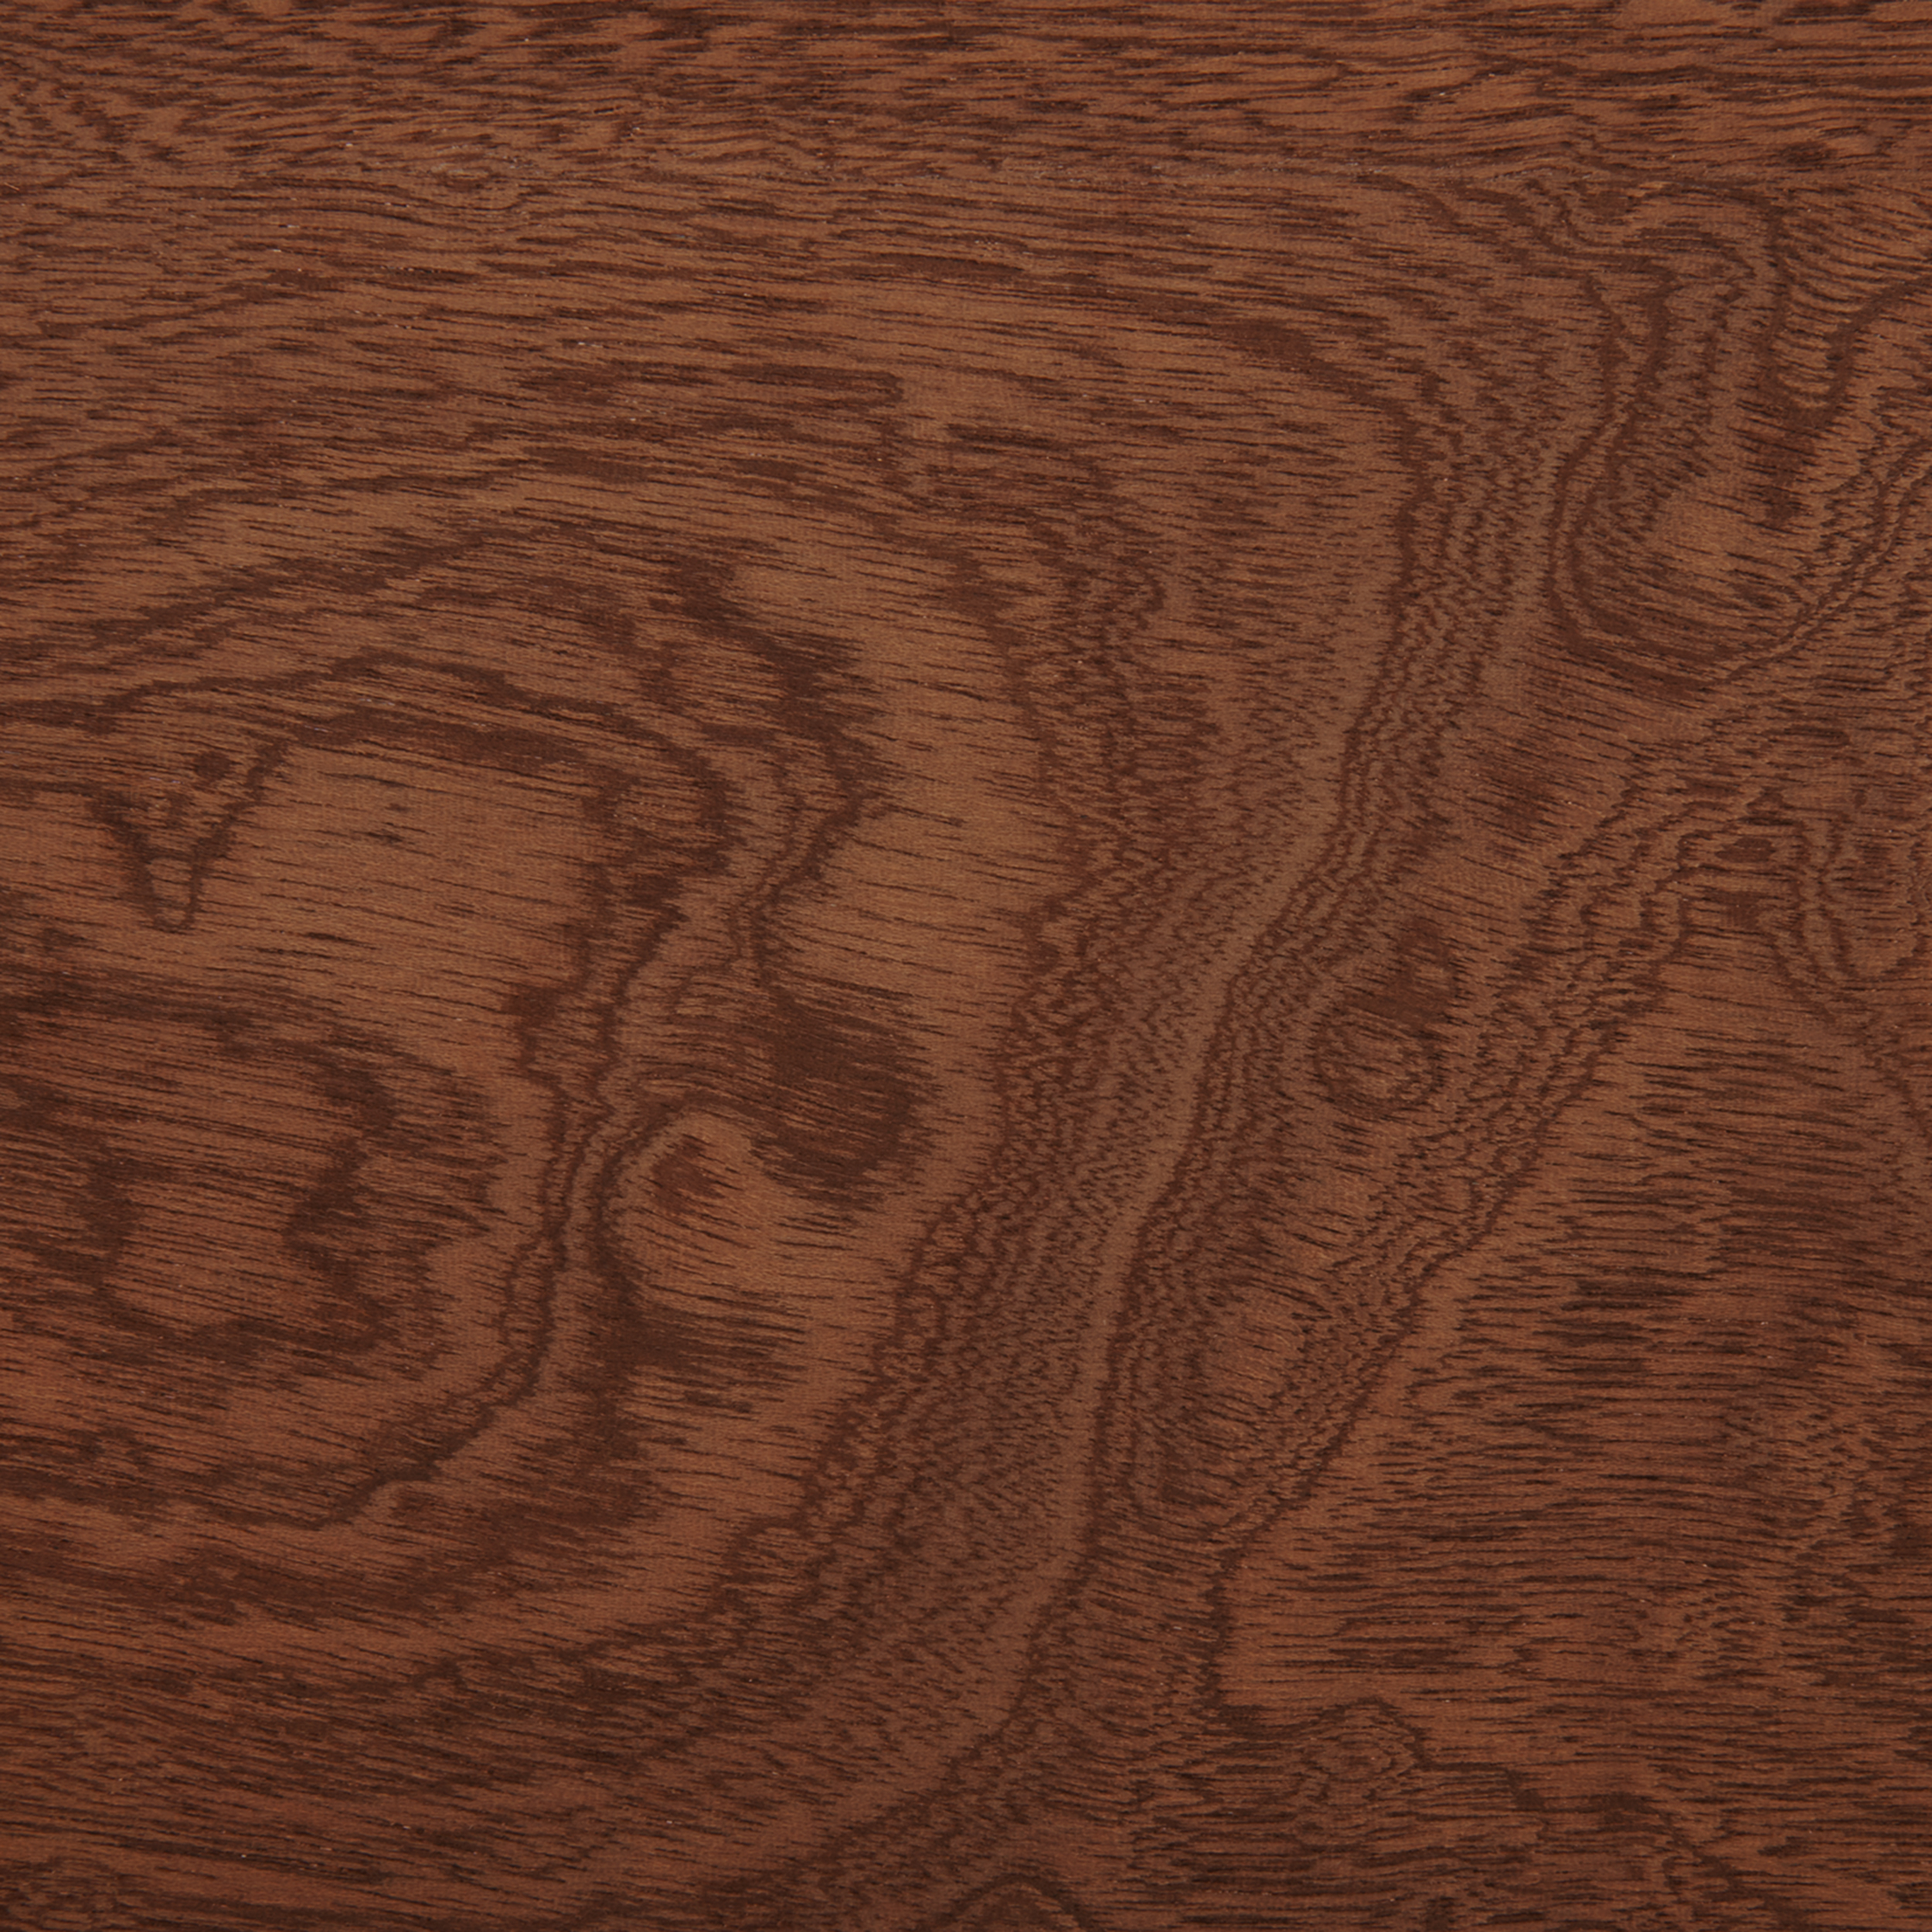 Sapele Veneer Sheet Pommele 4' x 8' 2-Ply Wood on Wood